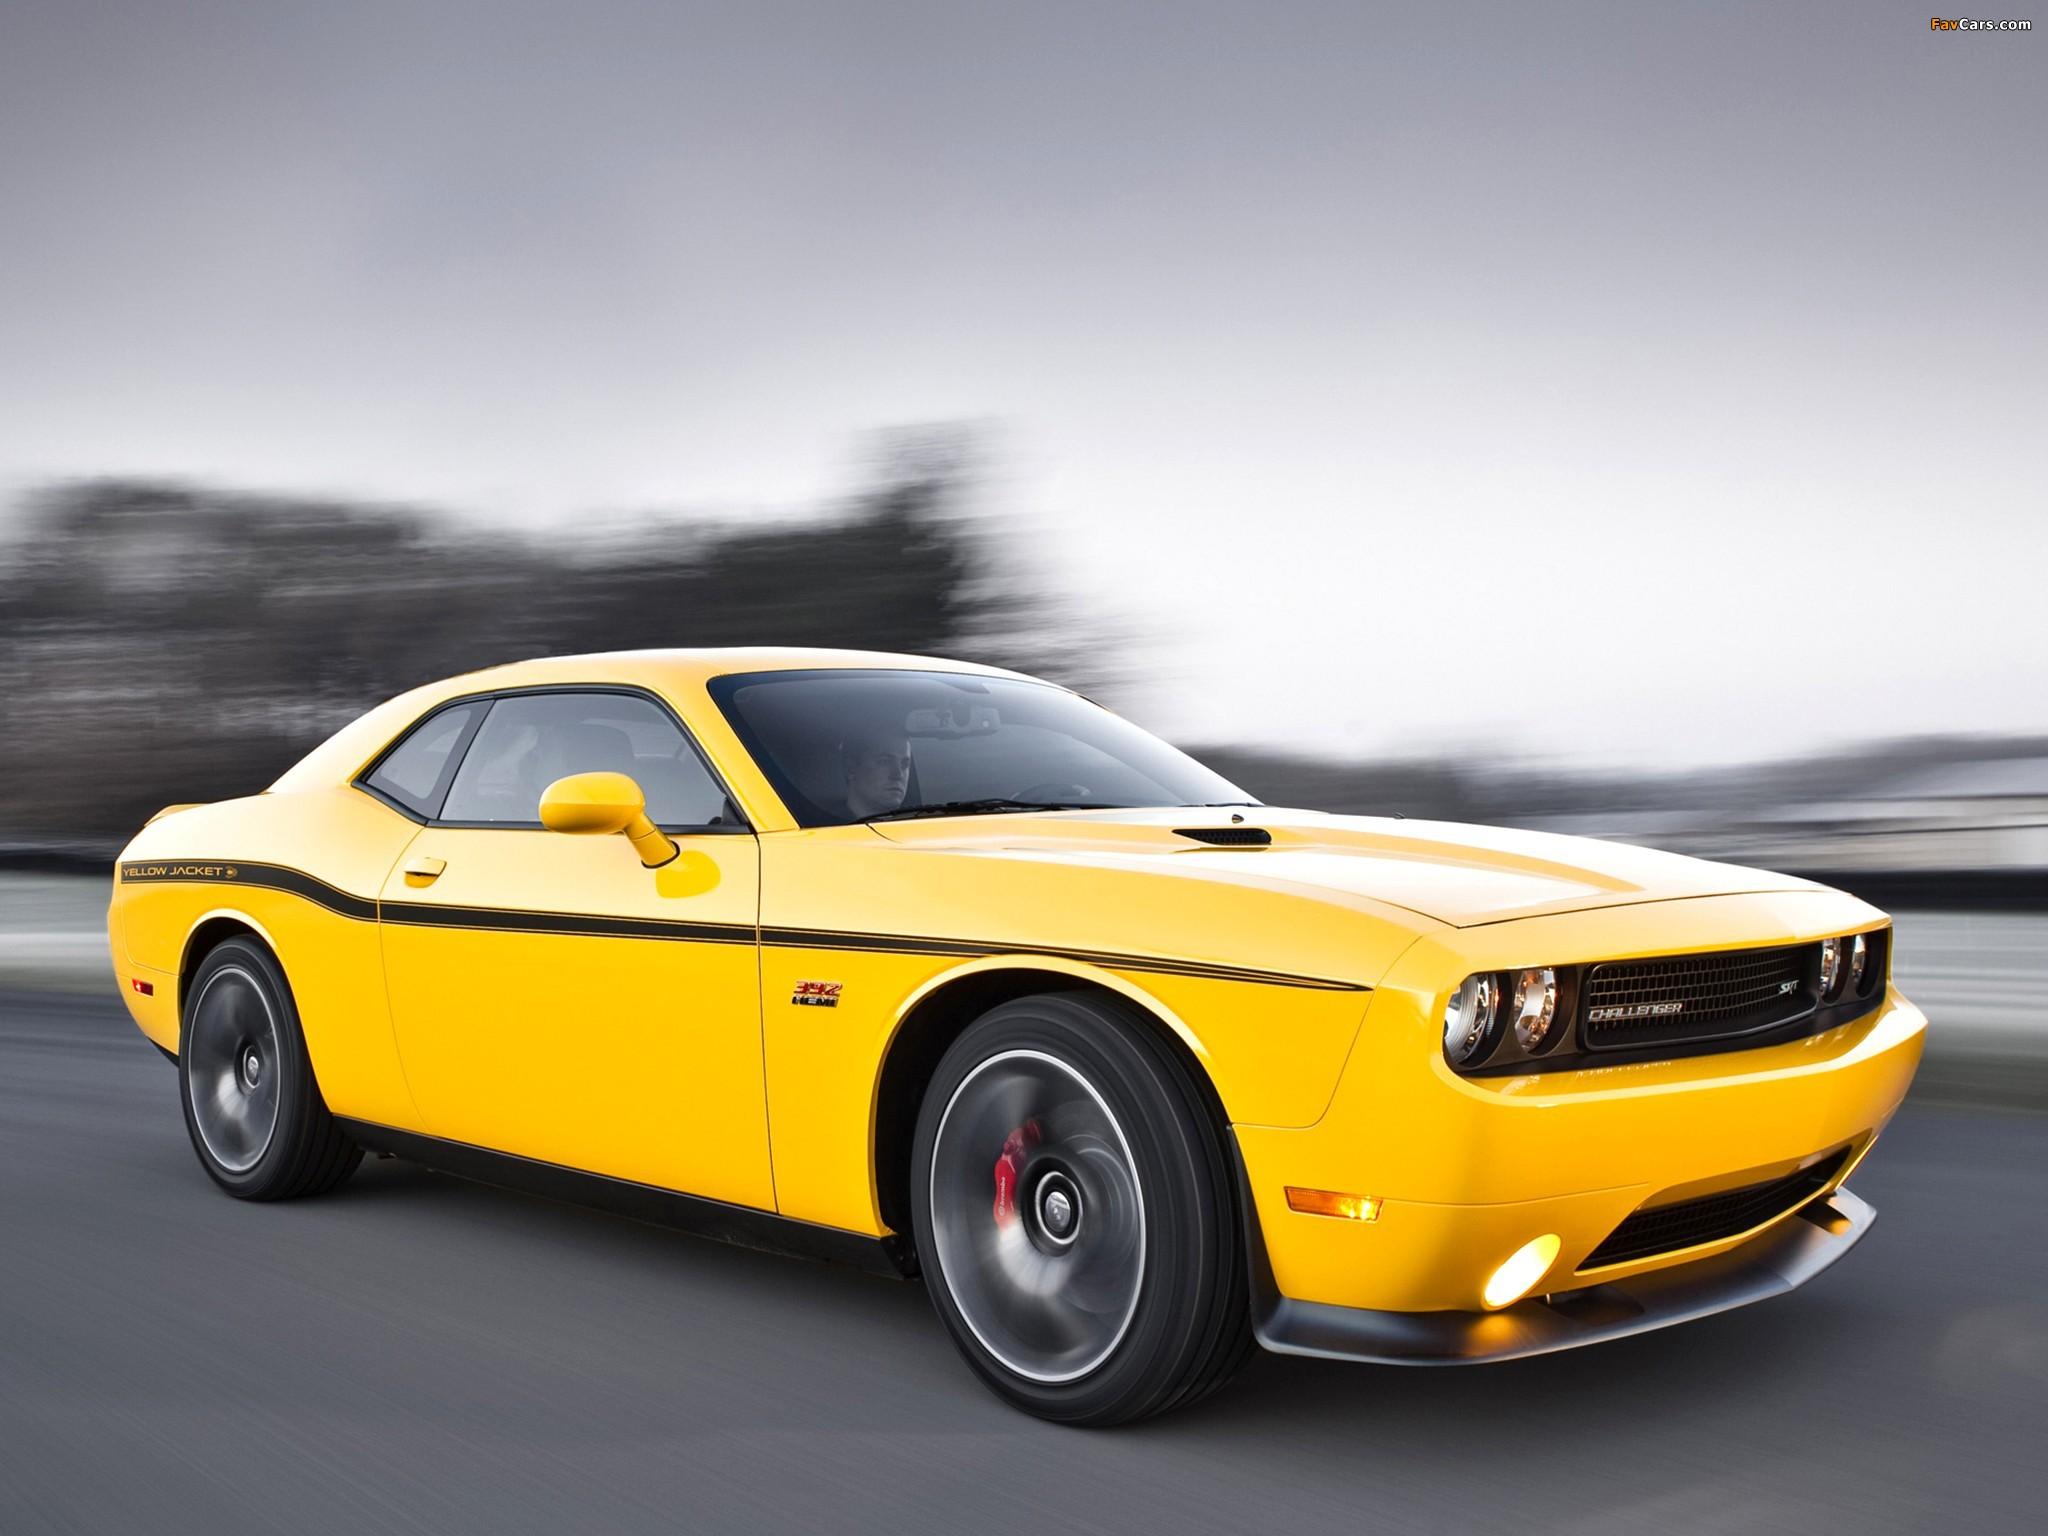 Dodge Challenger SRT8 392 Yellow Jacket (LC) 2012 photos (2048 x 1536)